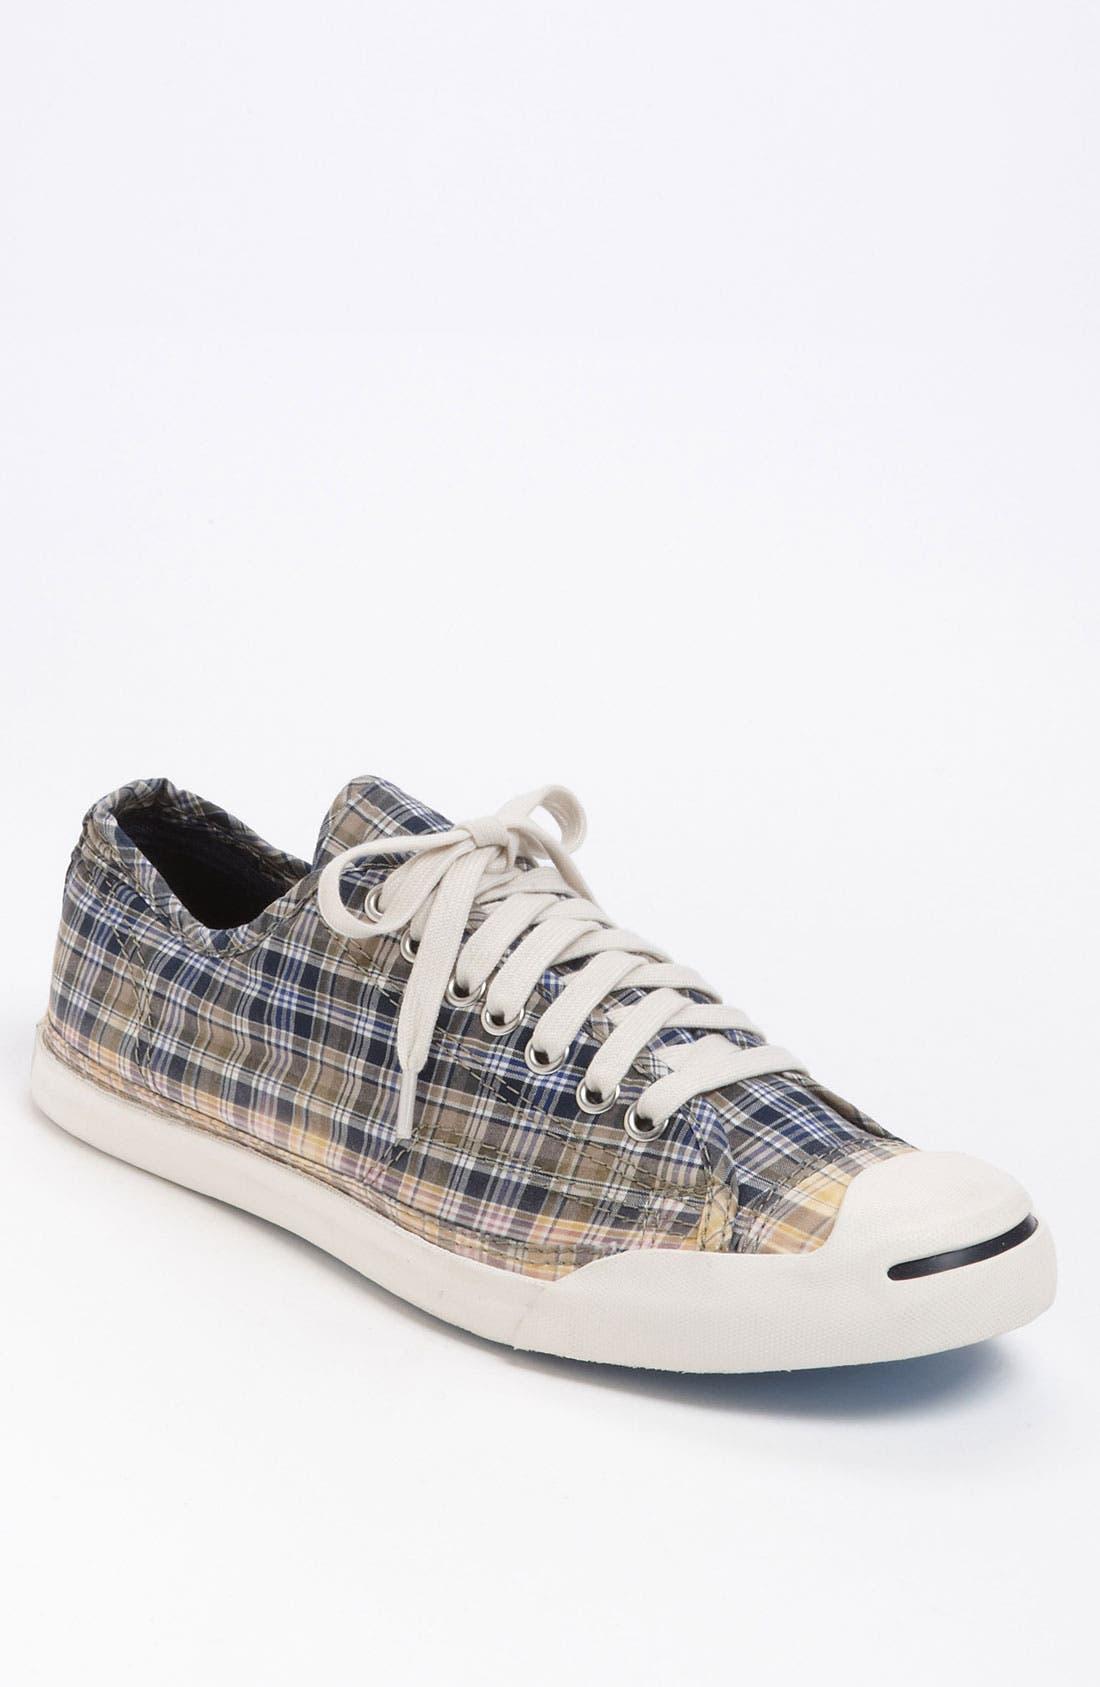 Alternate Image 1 Selected - Converse 'Jack Purcell' Sneaker (Men)